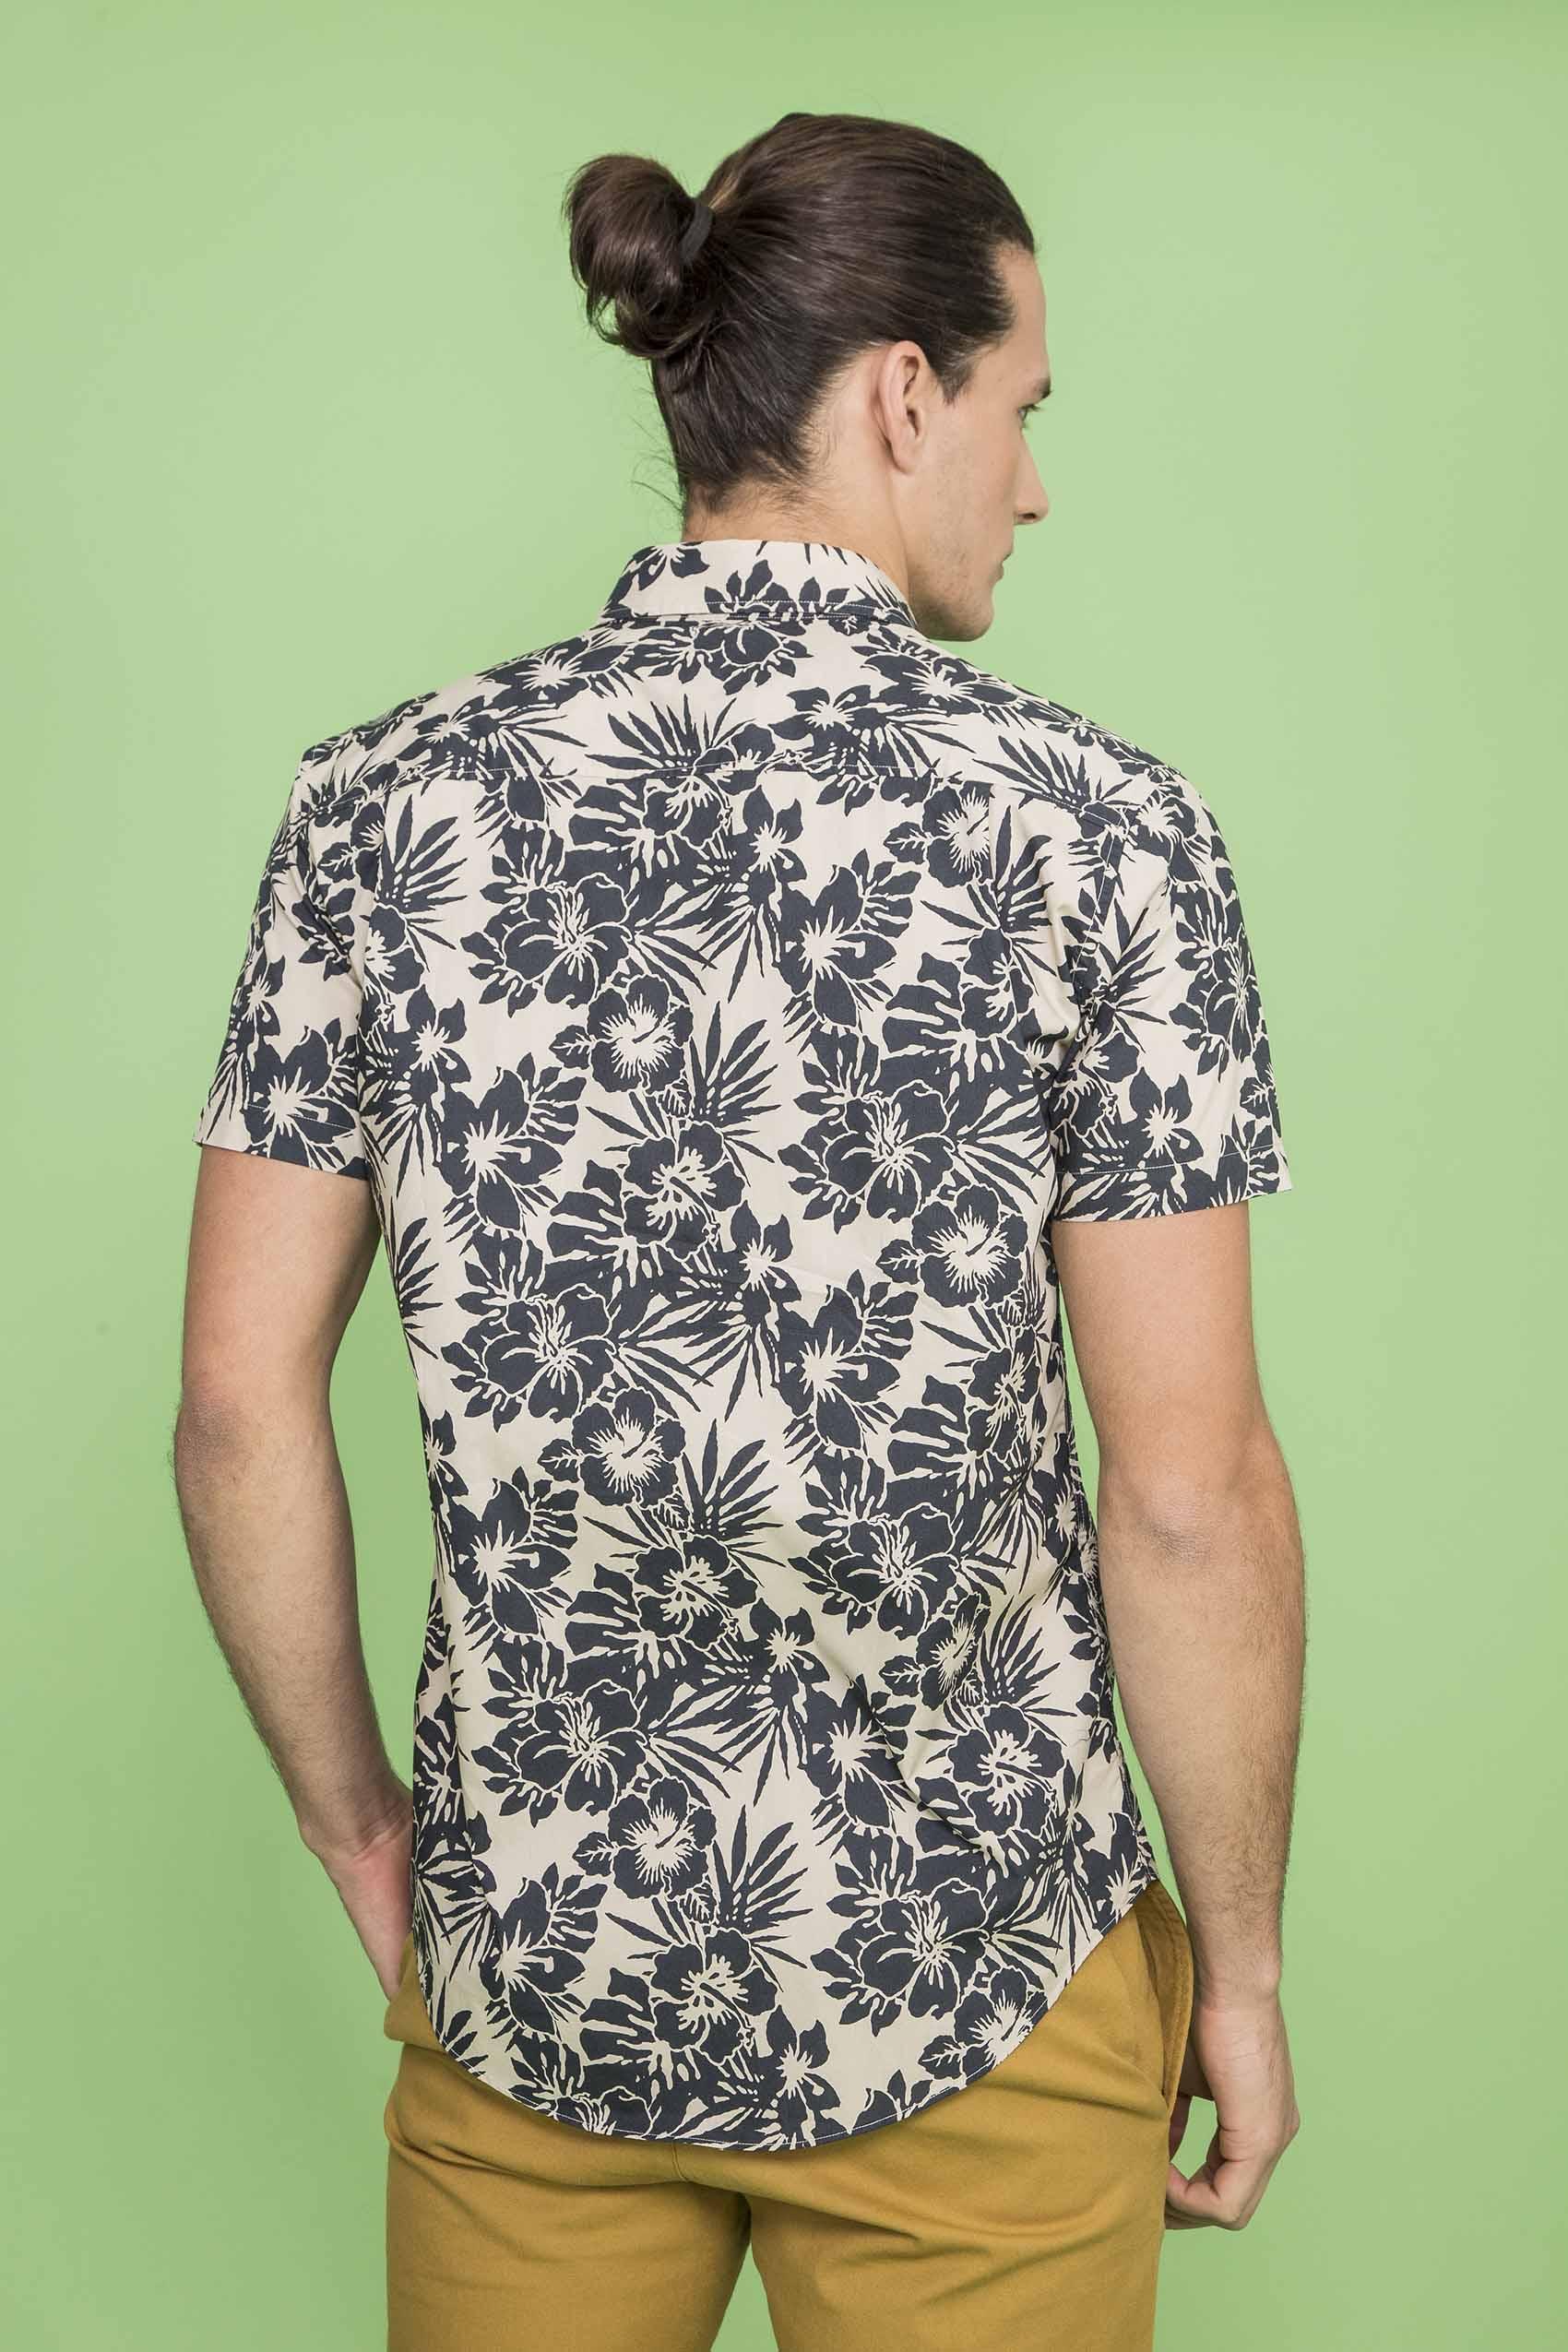 penguin_ss-surf-flower-print-shirt_45-14-2021__picture-16799